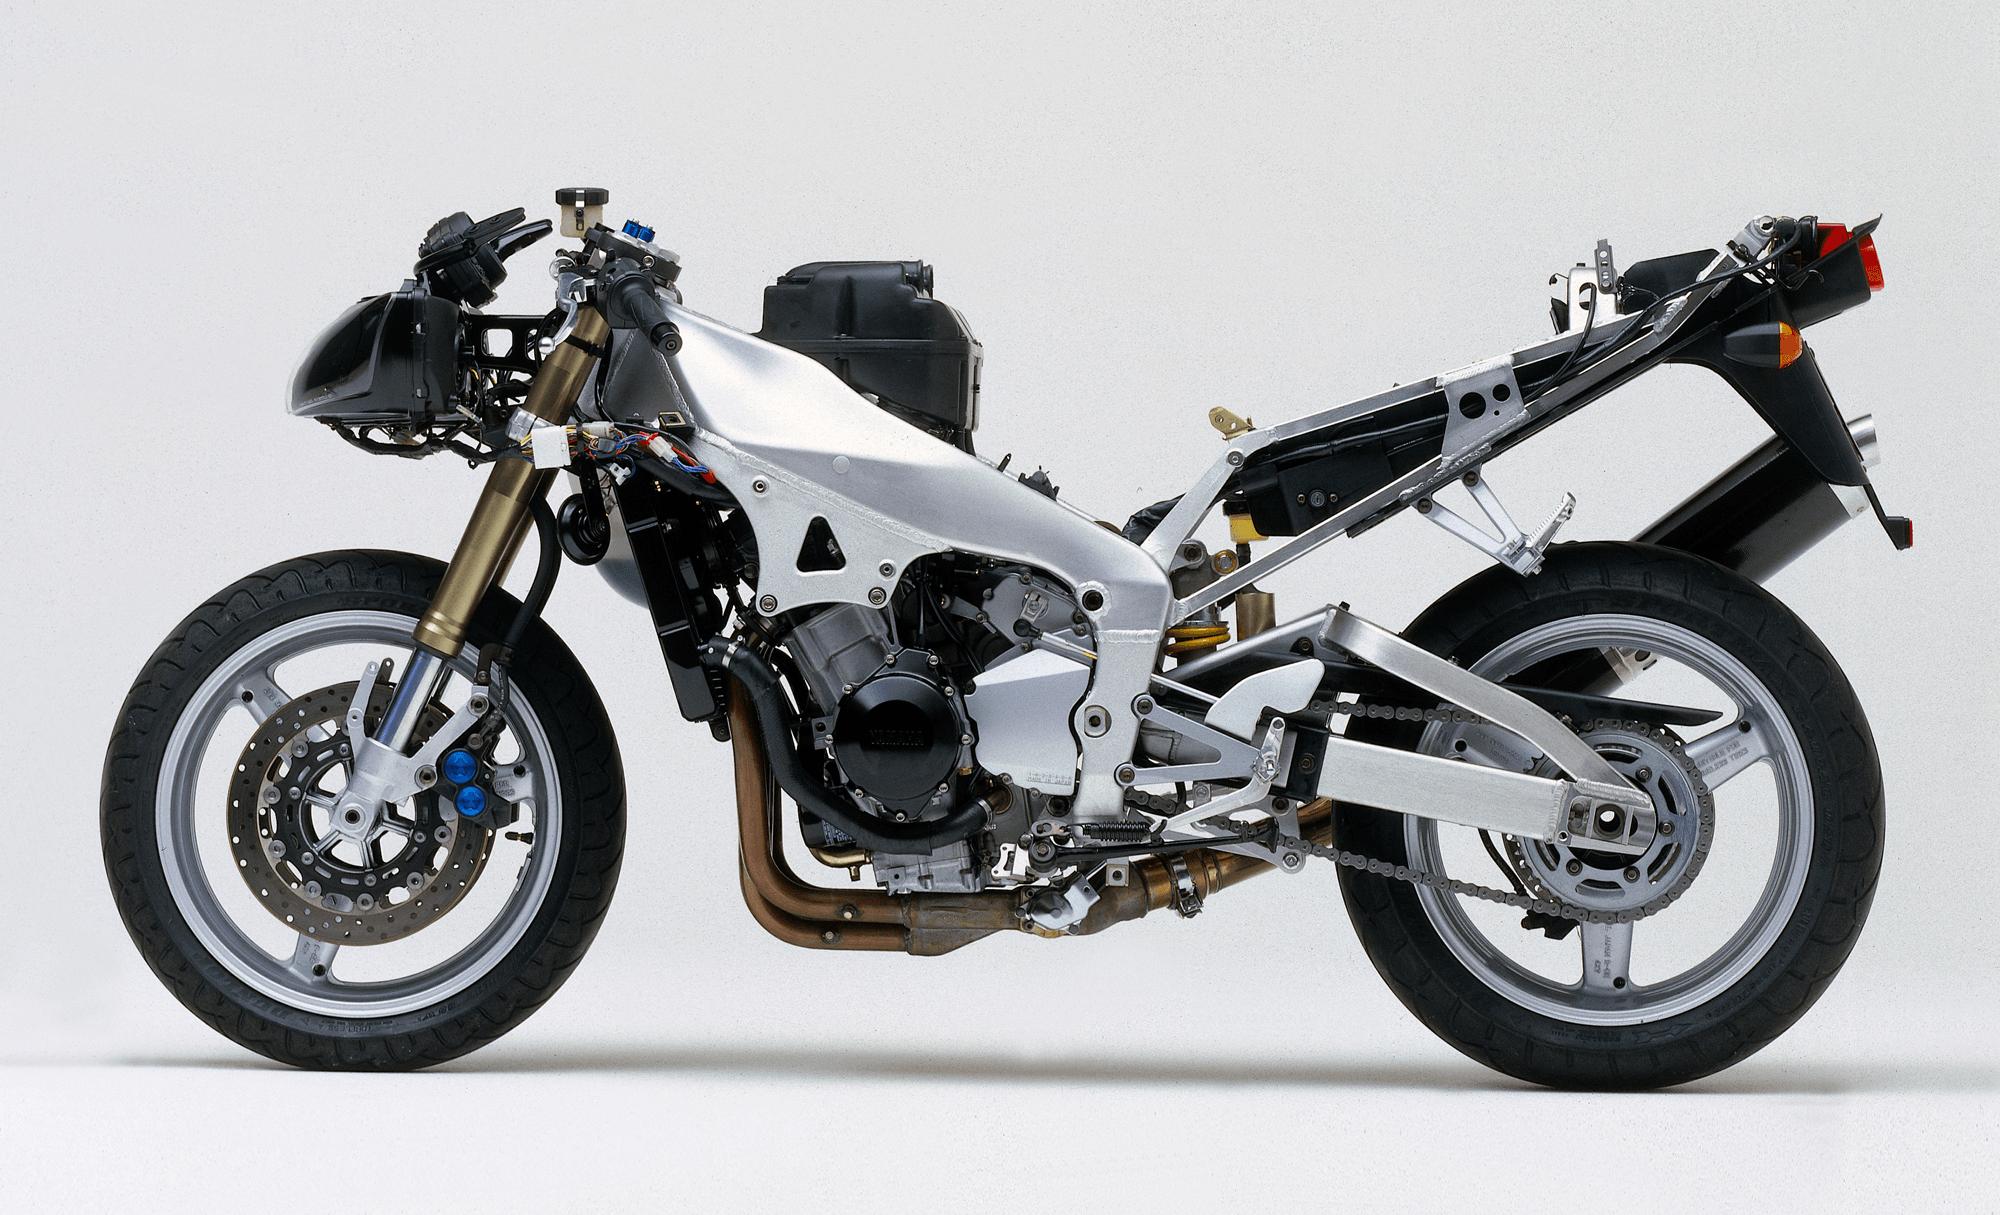 Yamaha YZF R1 5